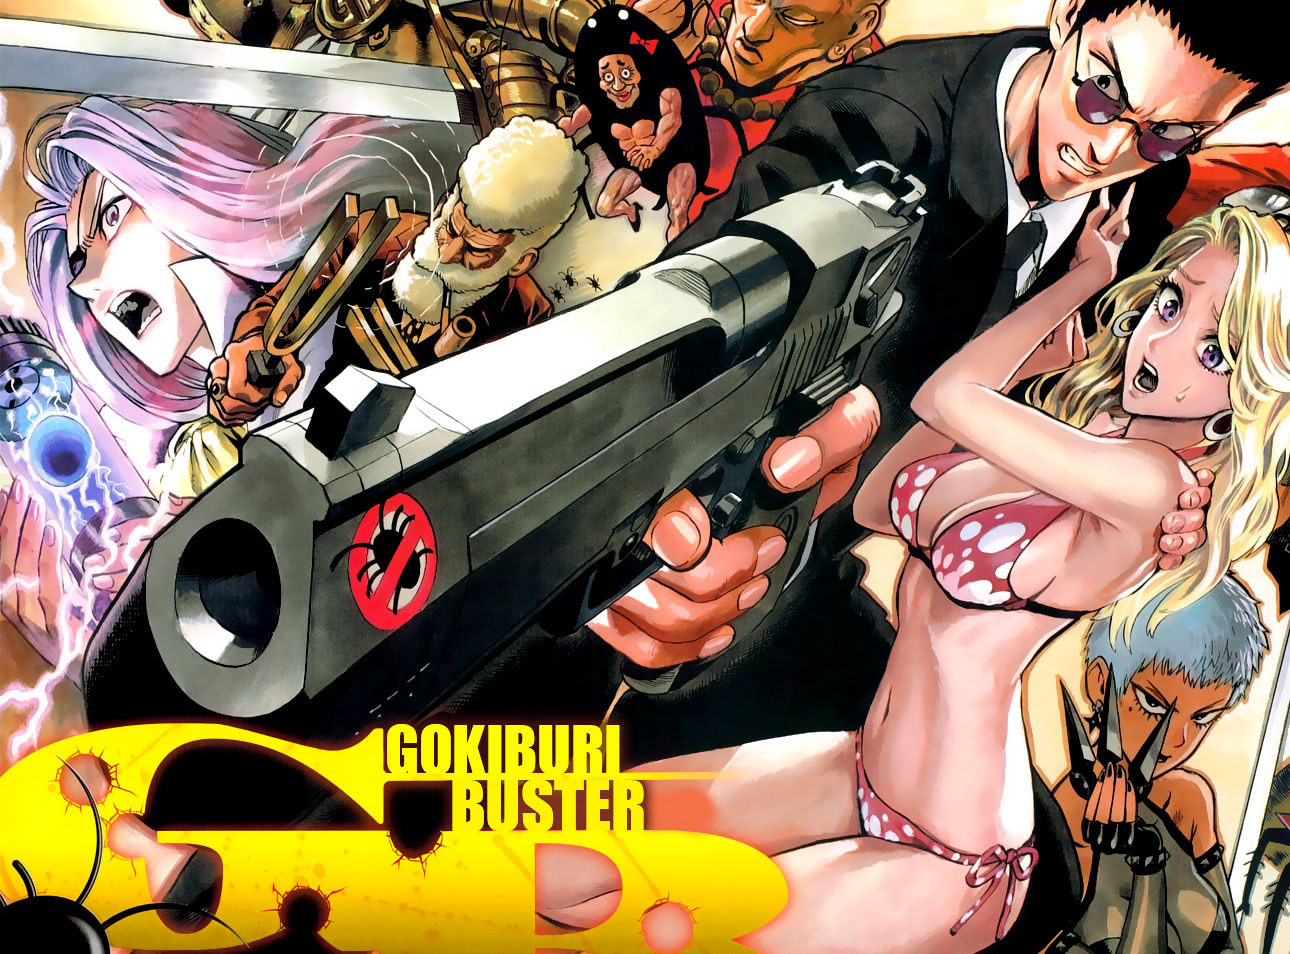 [Oneshot] Gokiburi Buster